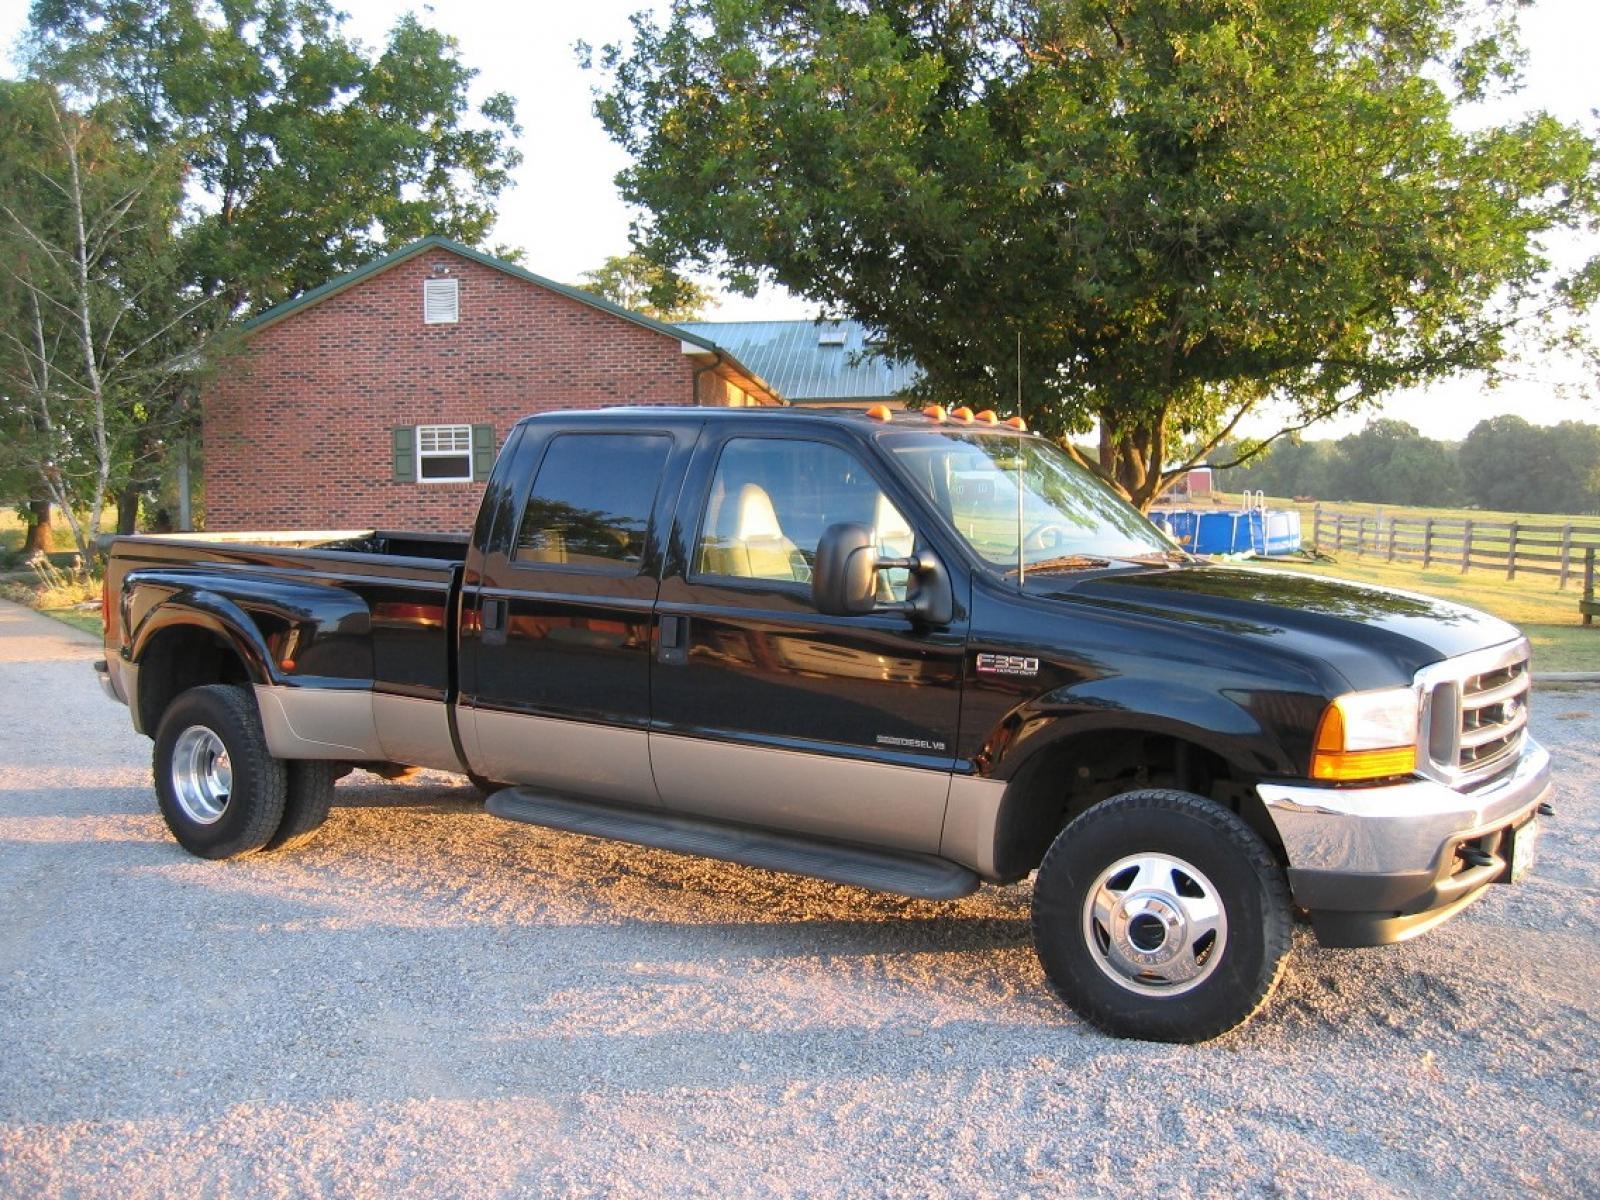 800 1024 1280 1600 origin 2003 ford f 350